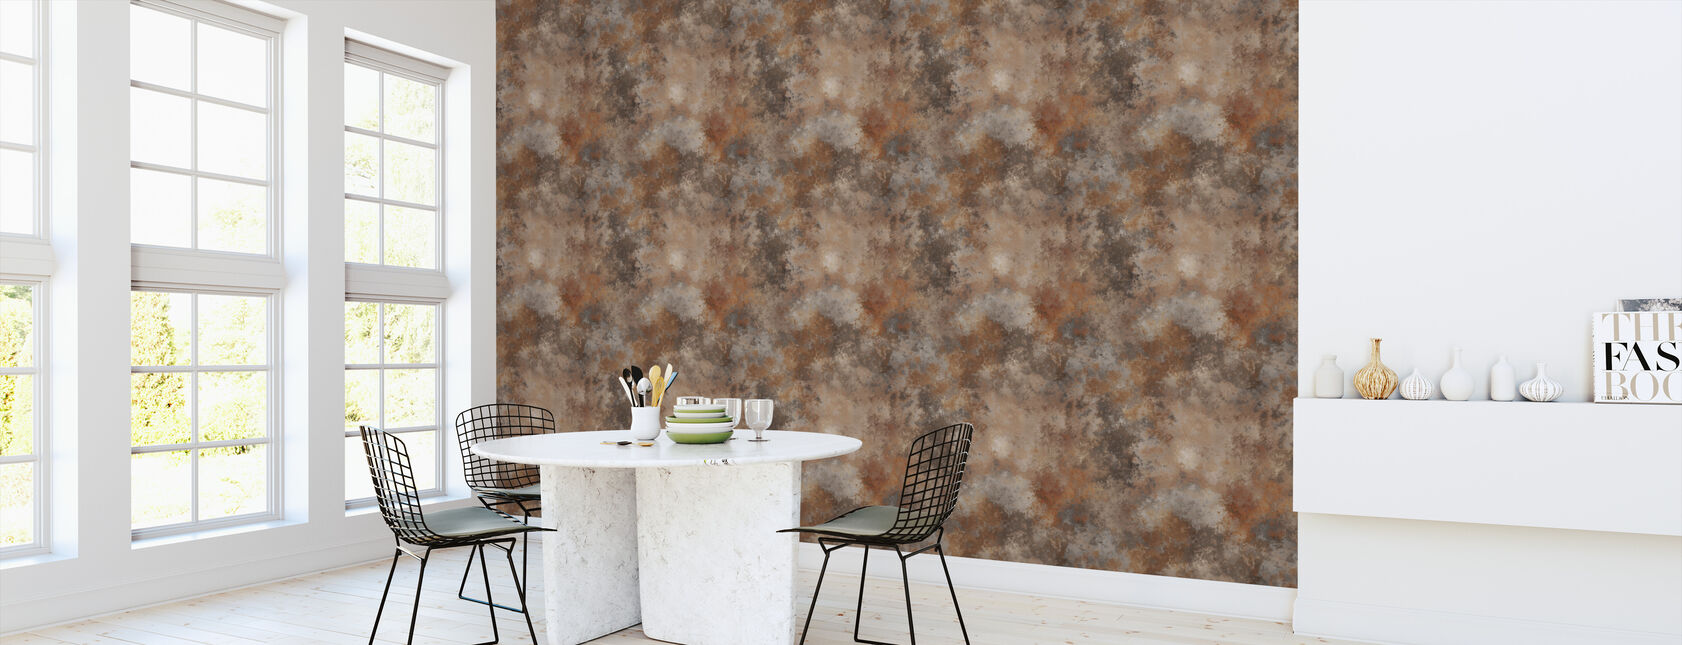 Rusty Metal - Wallpaper - Kitchen